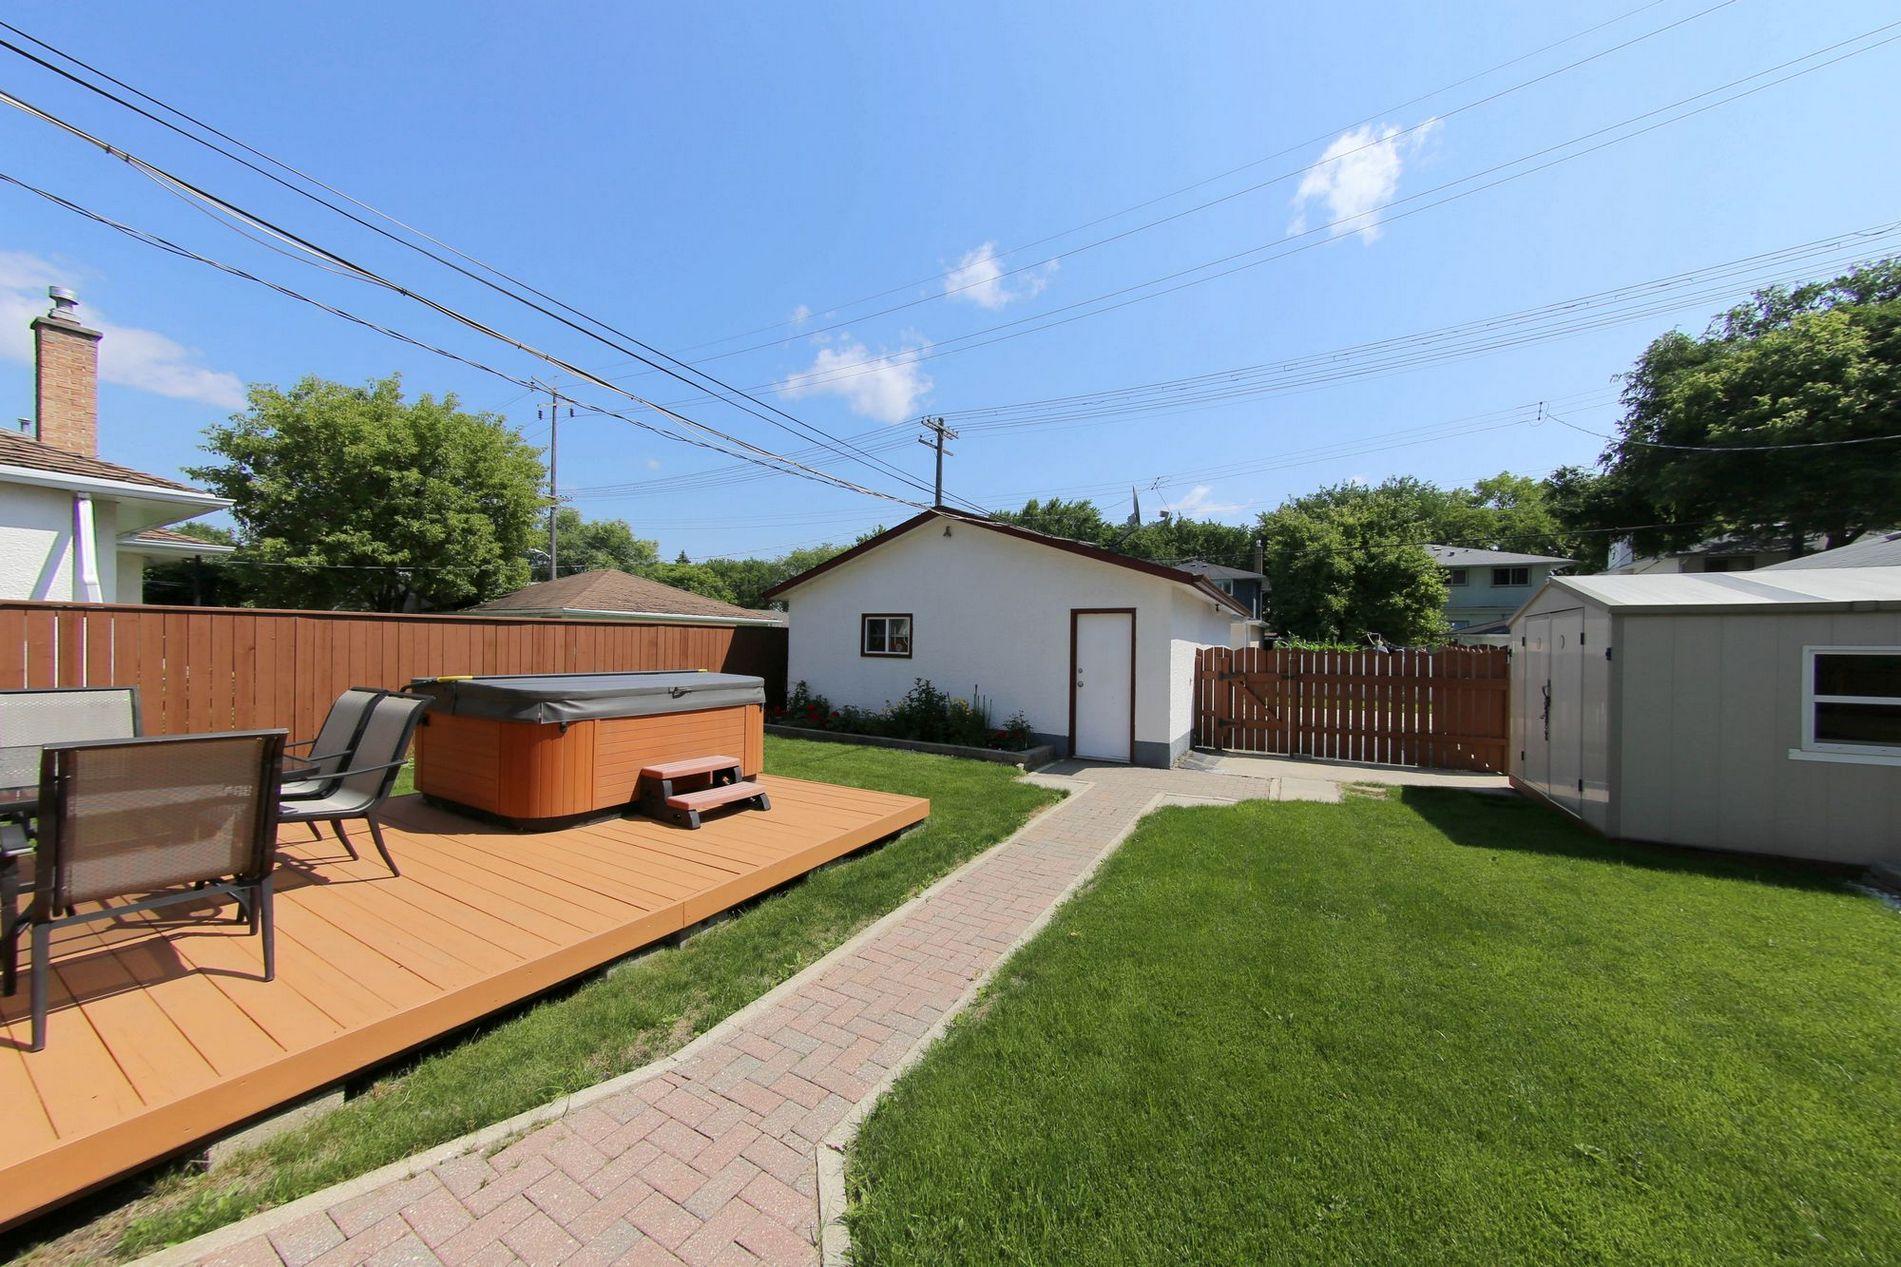 804 Borebank Street, Winnipeg, Manitoba  R3N 1G4 - Photo 23 - 1716415